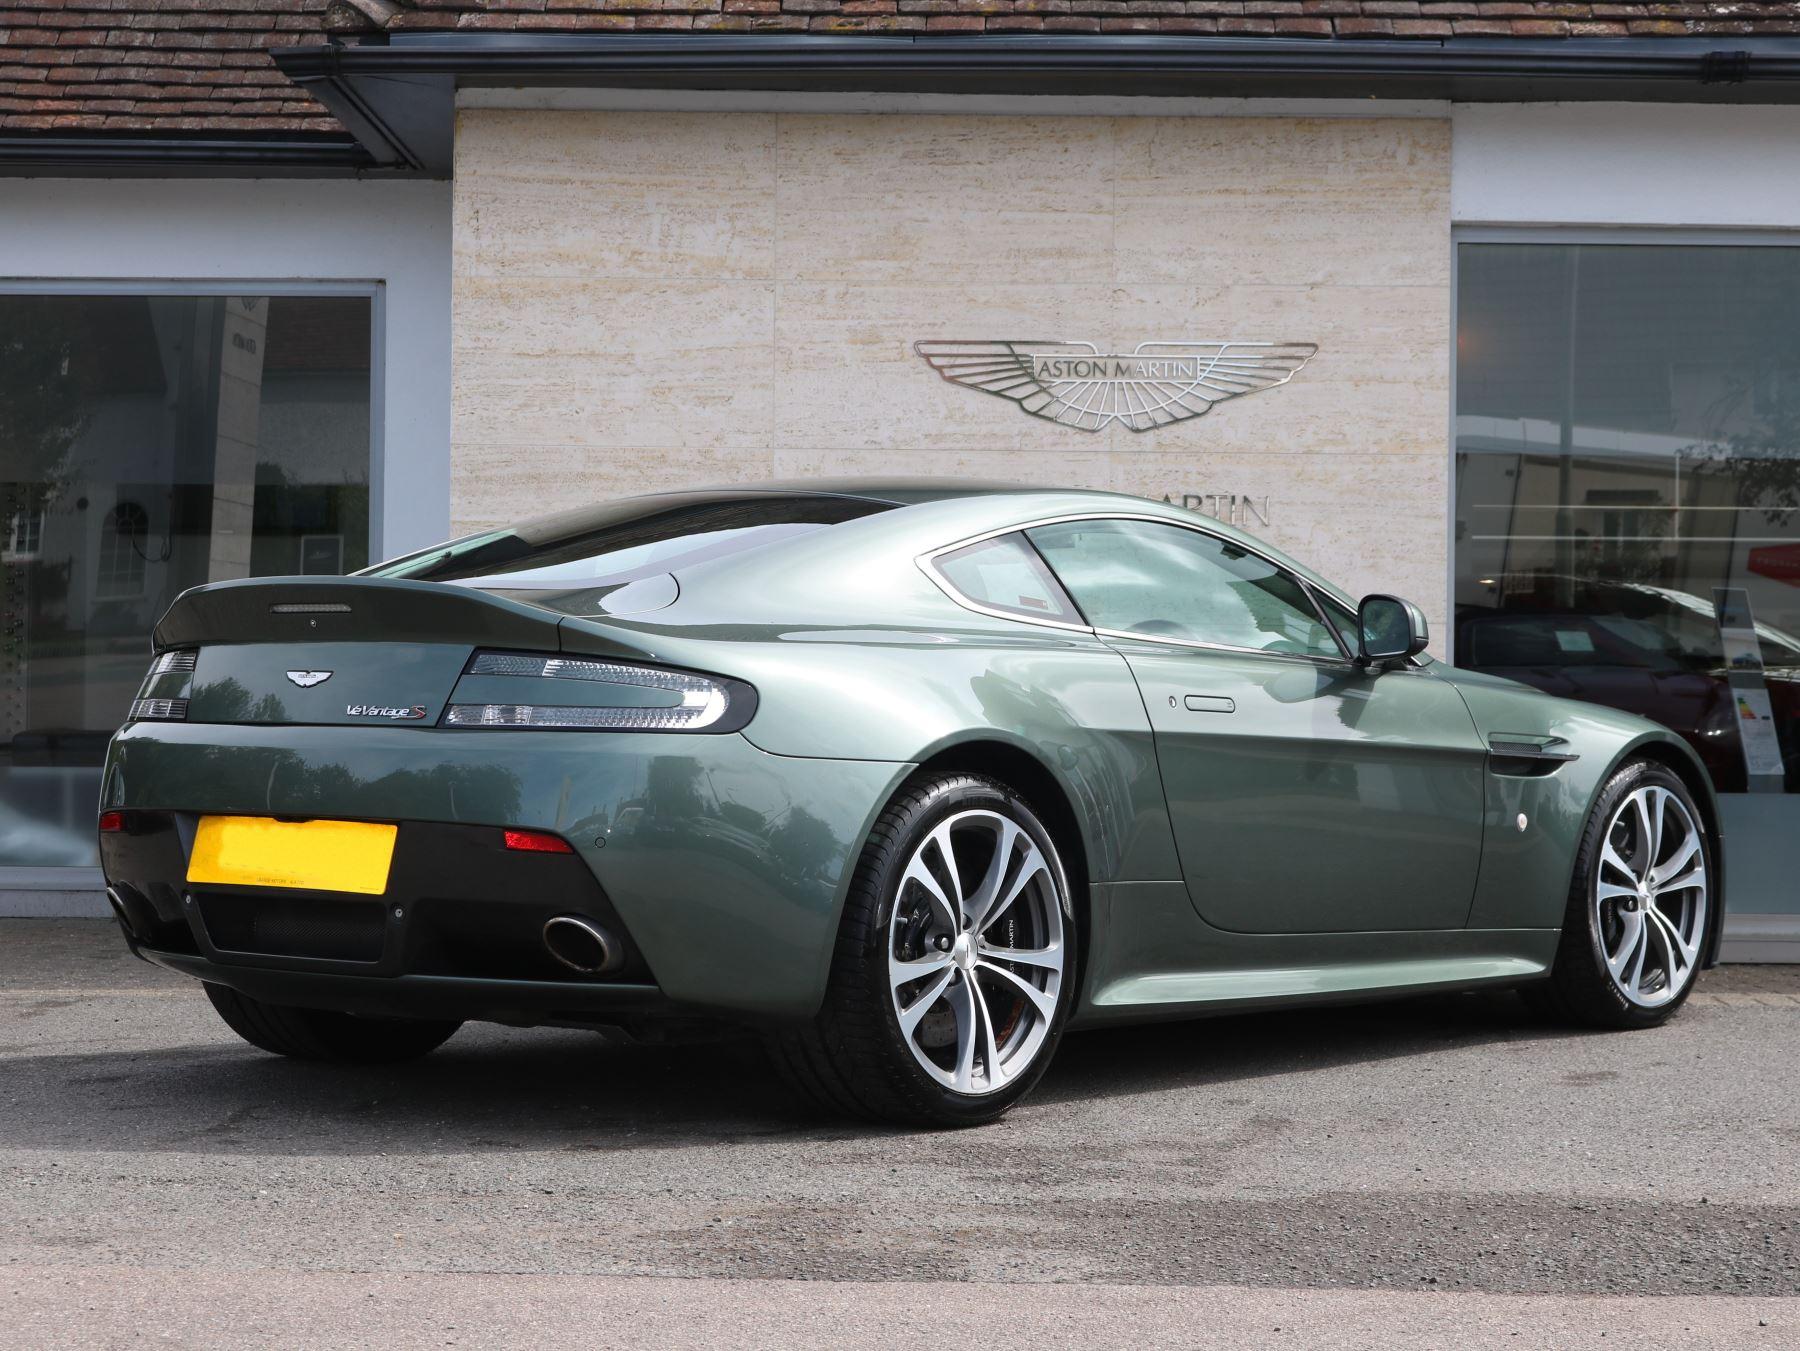 Aston Martin V Vantage S Coupe Dr Sportshift III Automatic - Aston martin v12